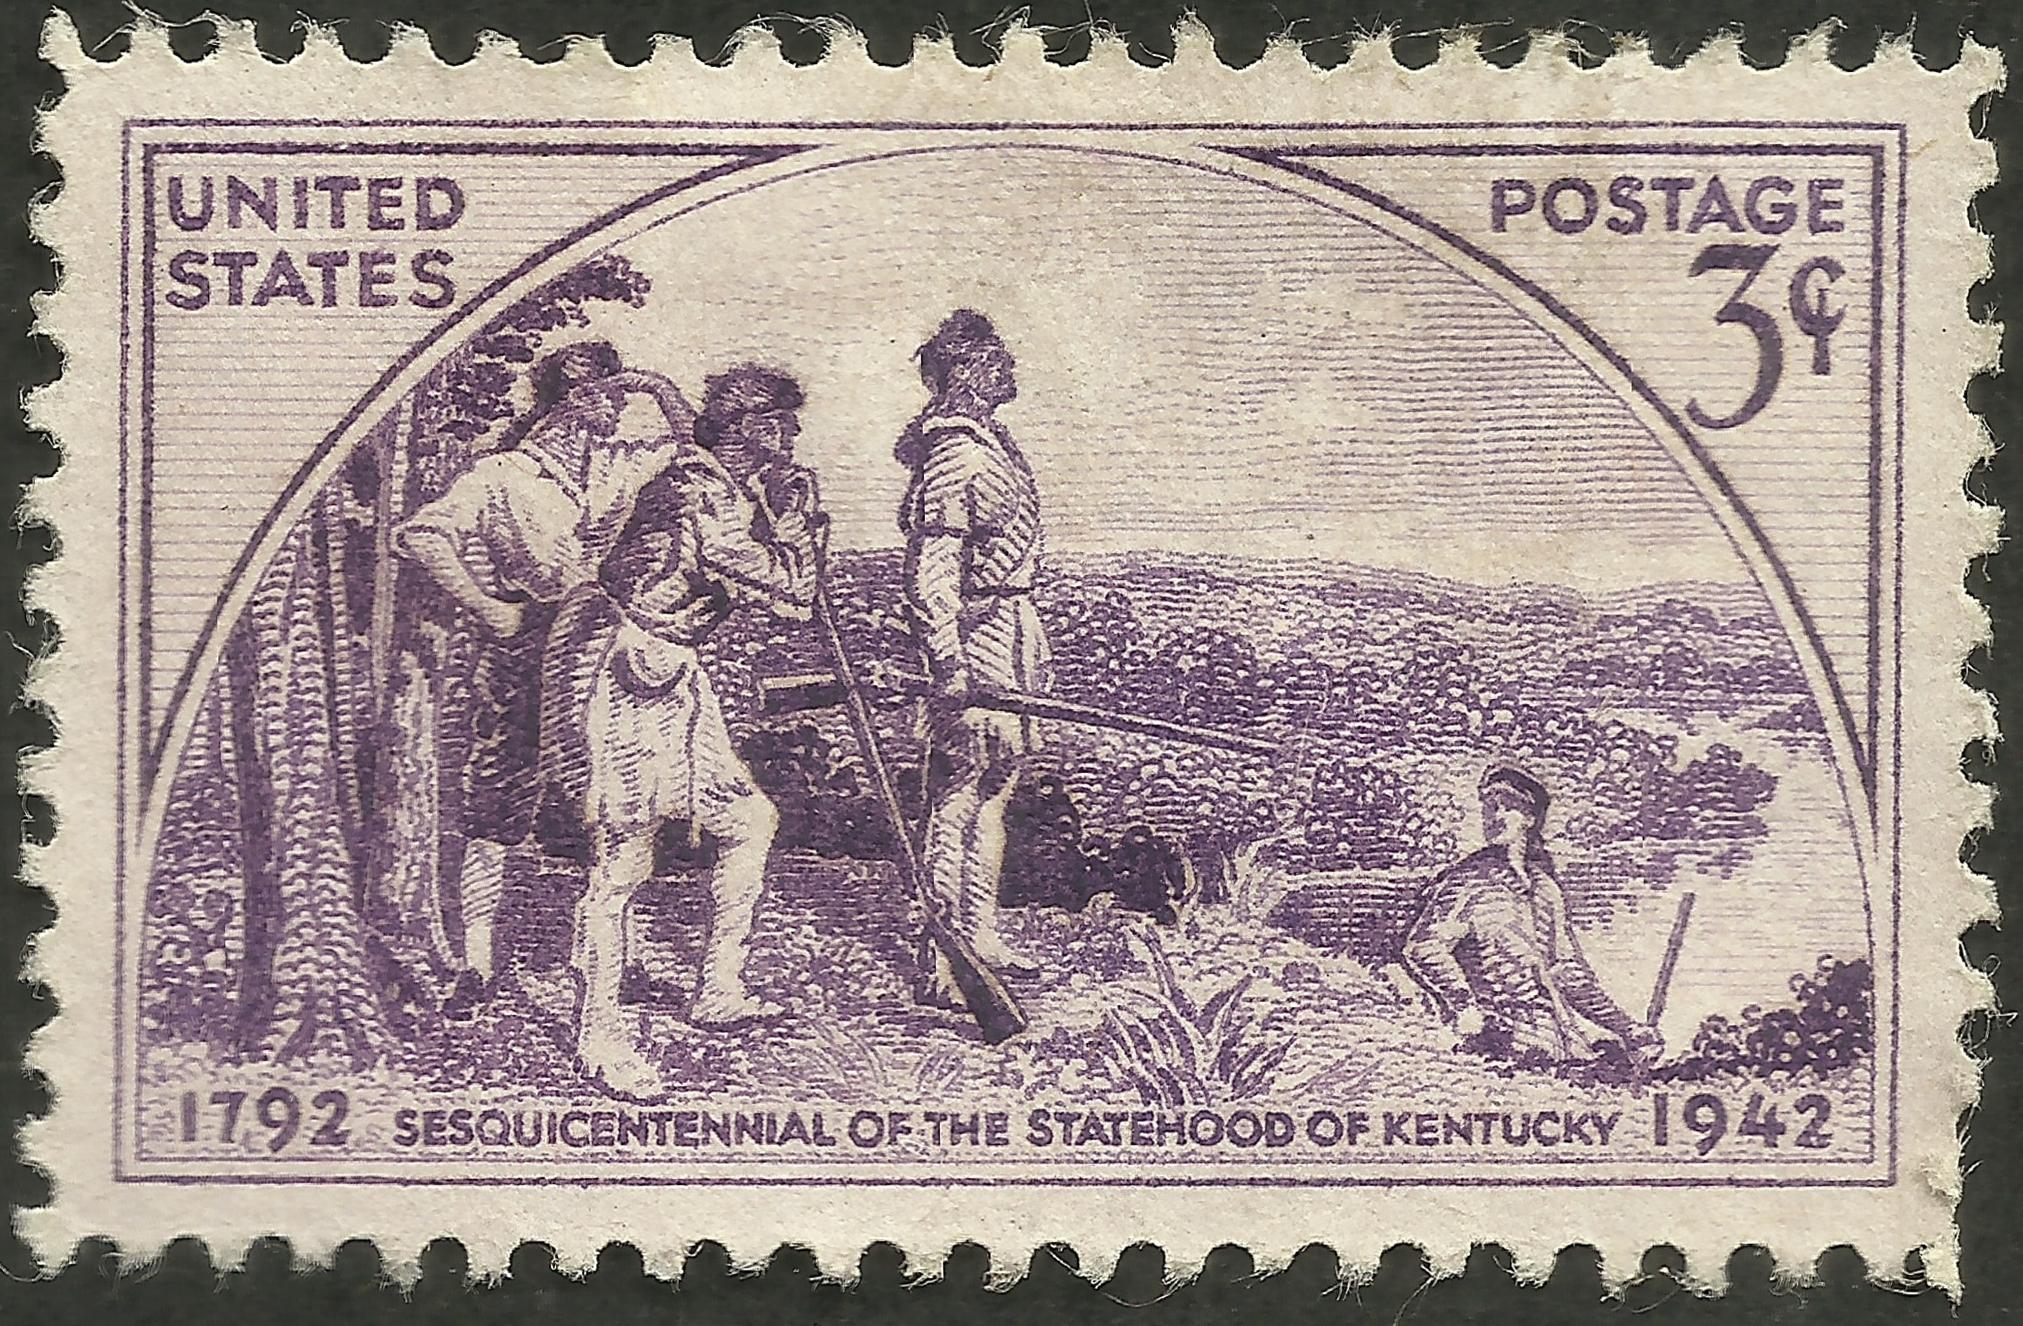 United States - Scott #904 (1942) lighter violet shade